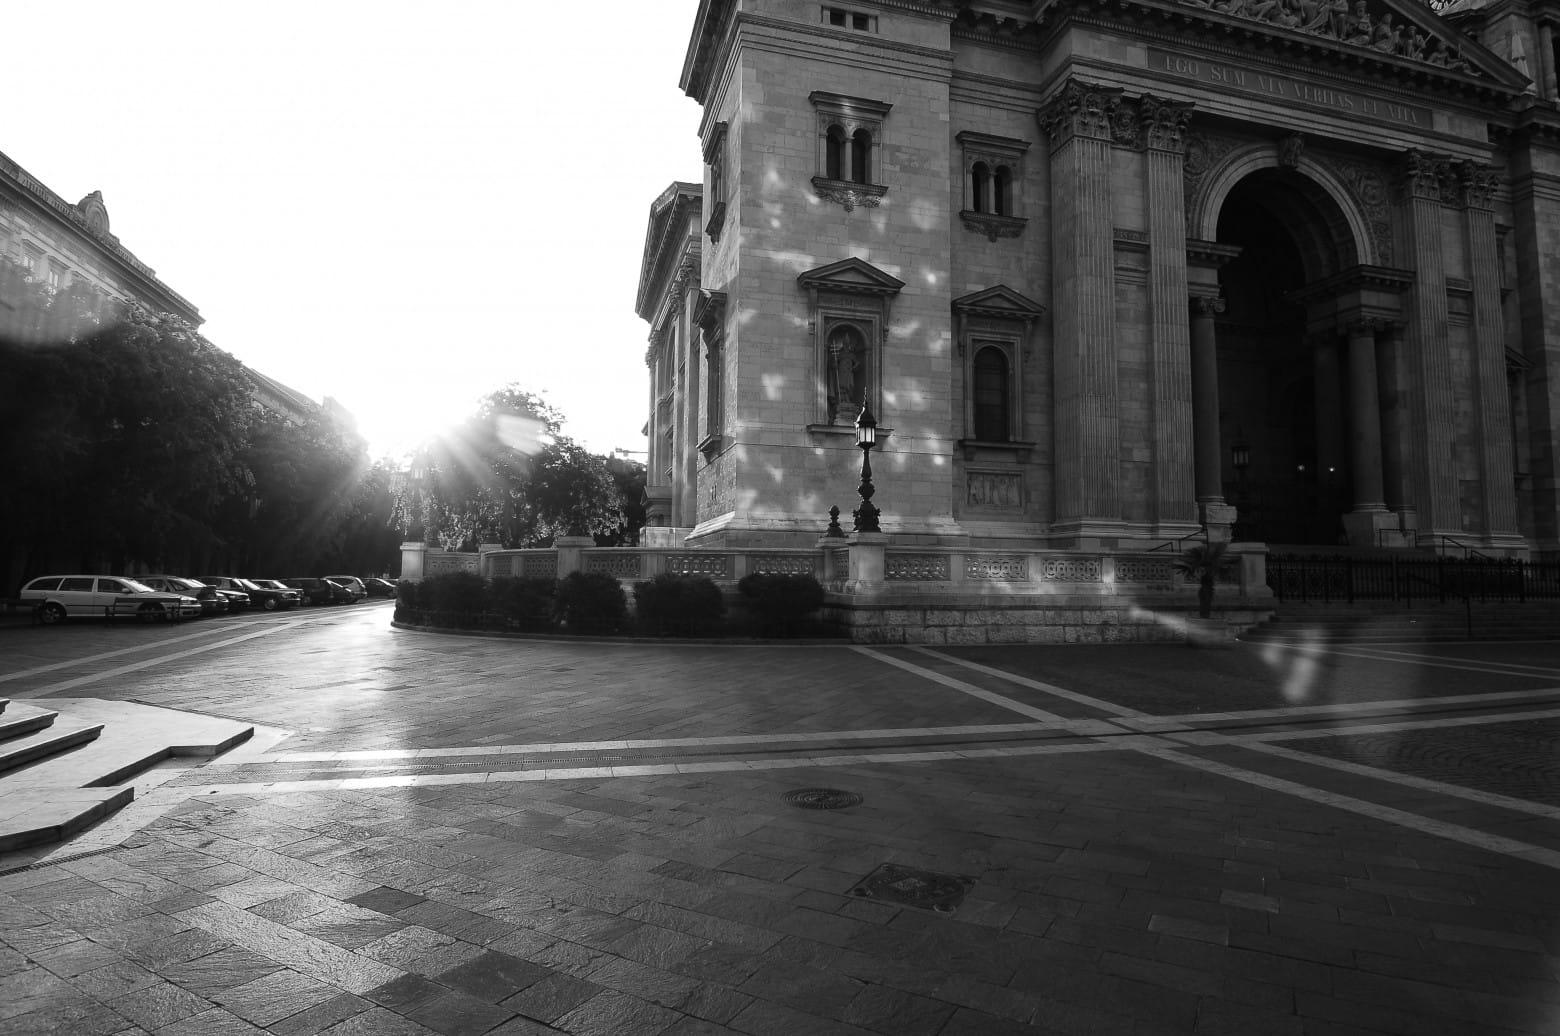 Bazilika_terasz_setany_felvono_foto_hajnal_ter